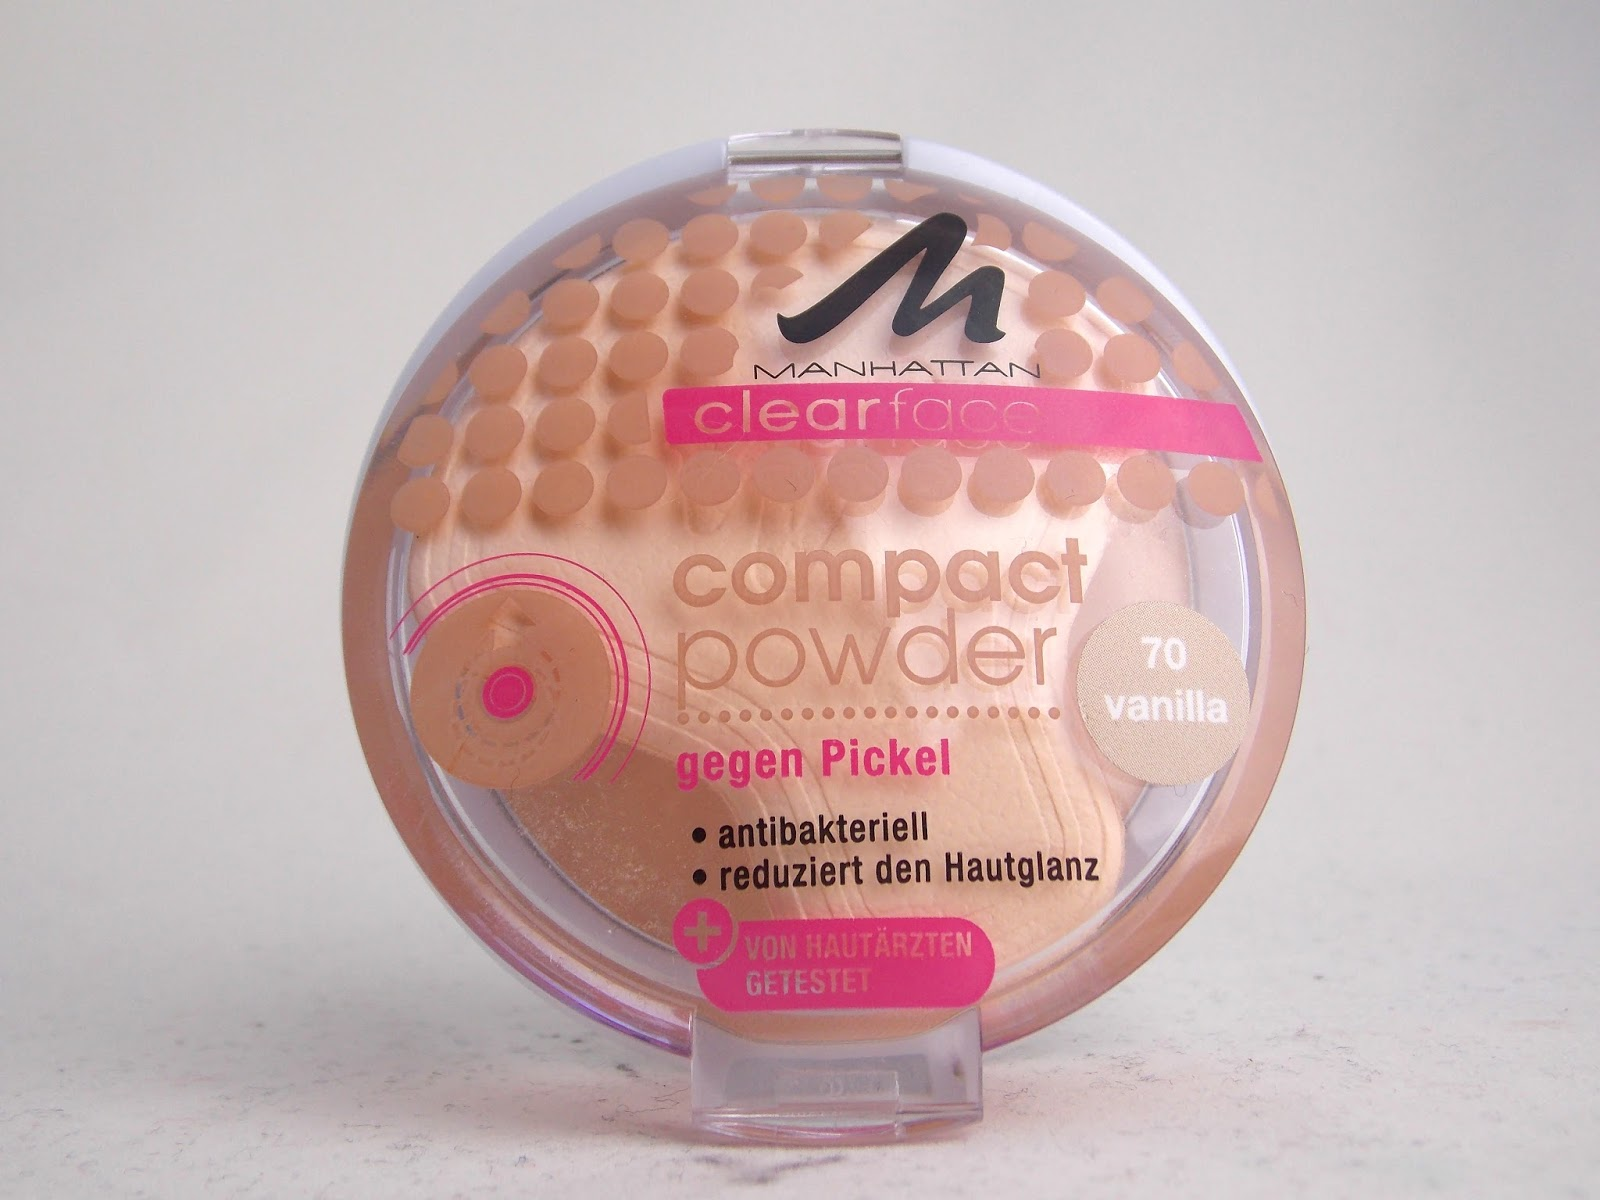 review manhattan clearface compact powder puder 70 vanilla julias beauty blog. Black Bedroom Furniture Sets. Home Design Ideas